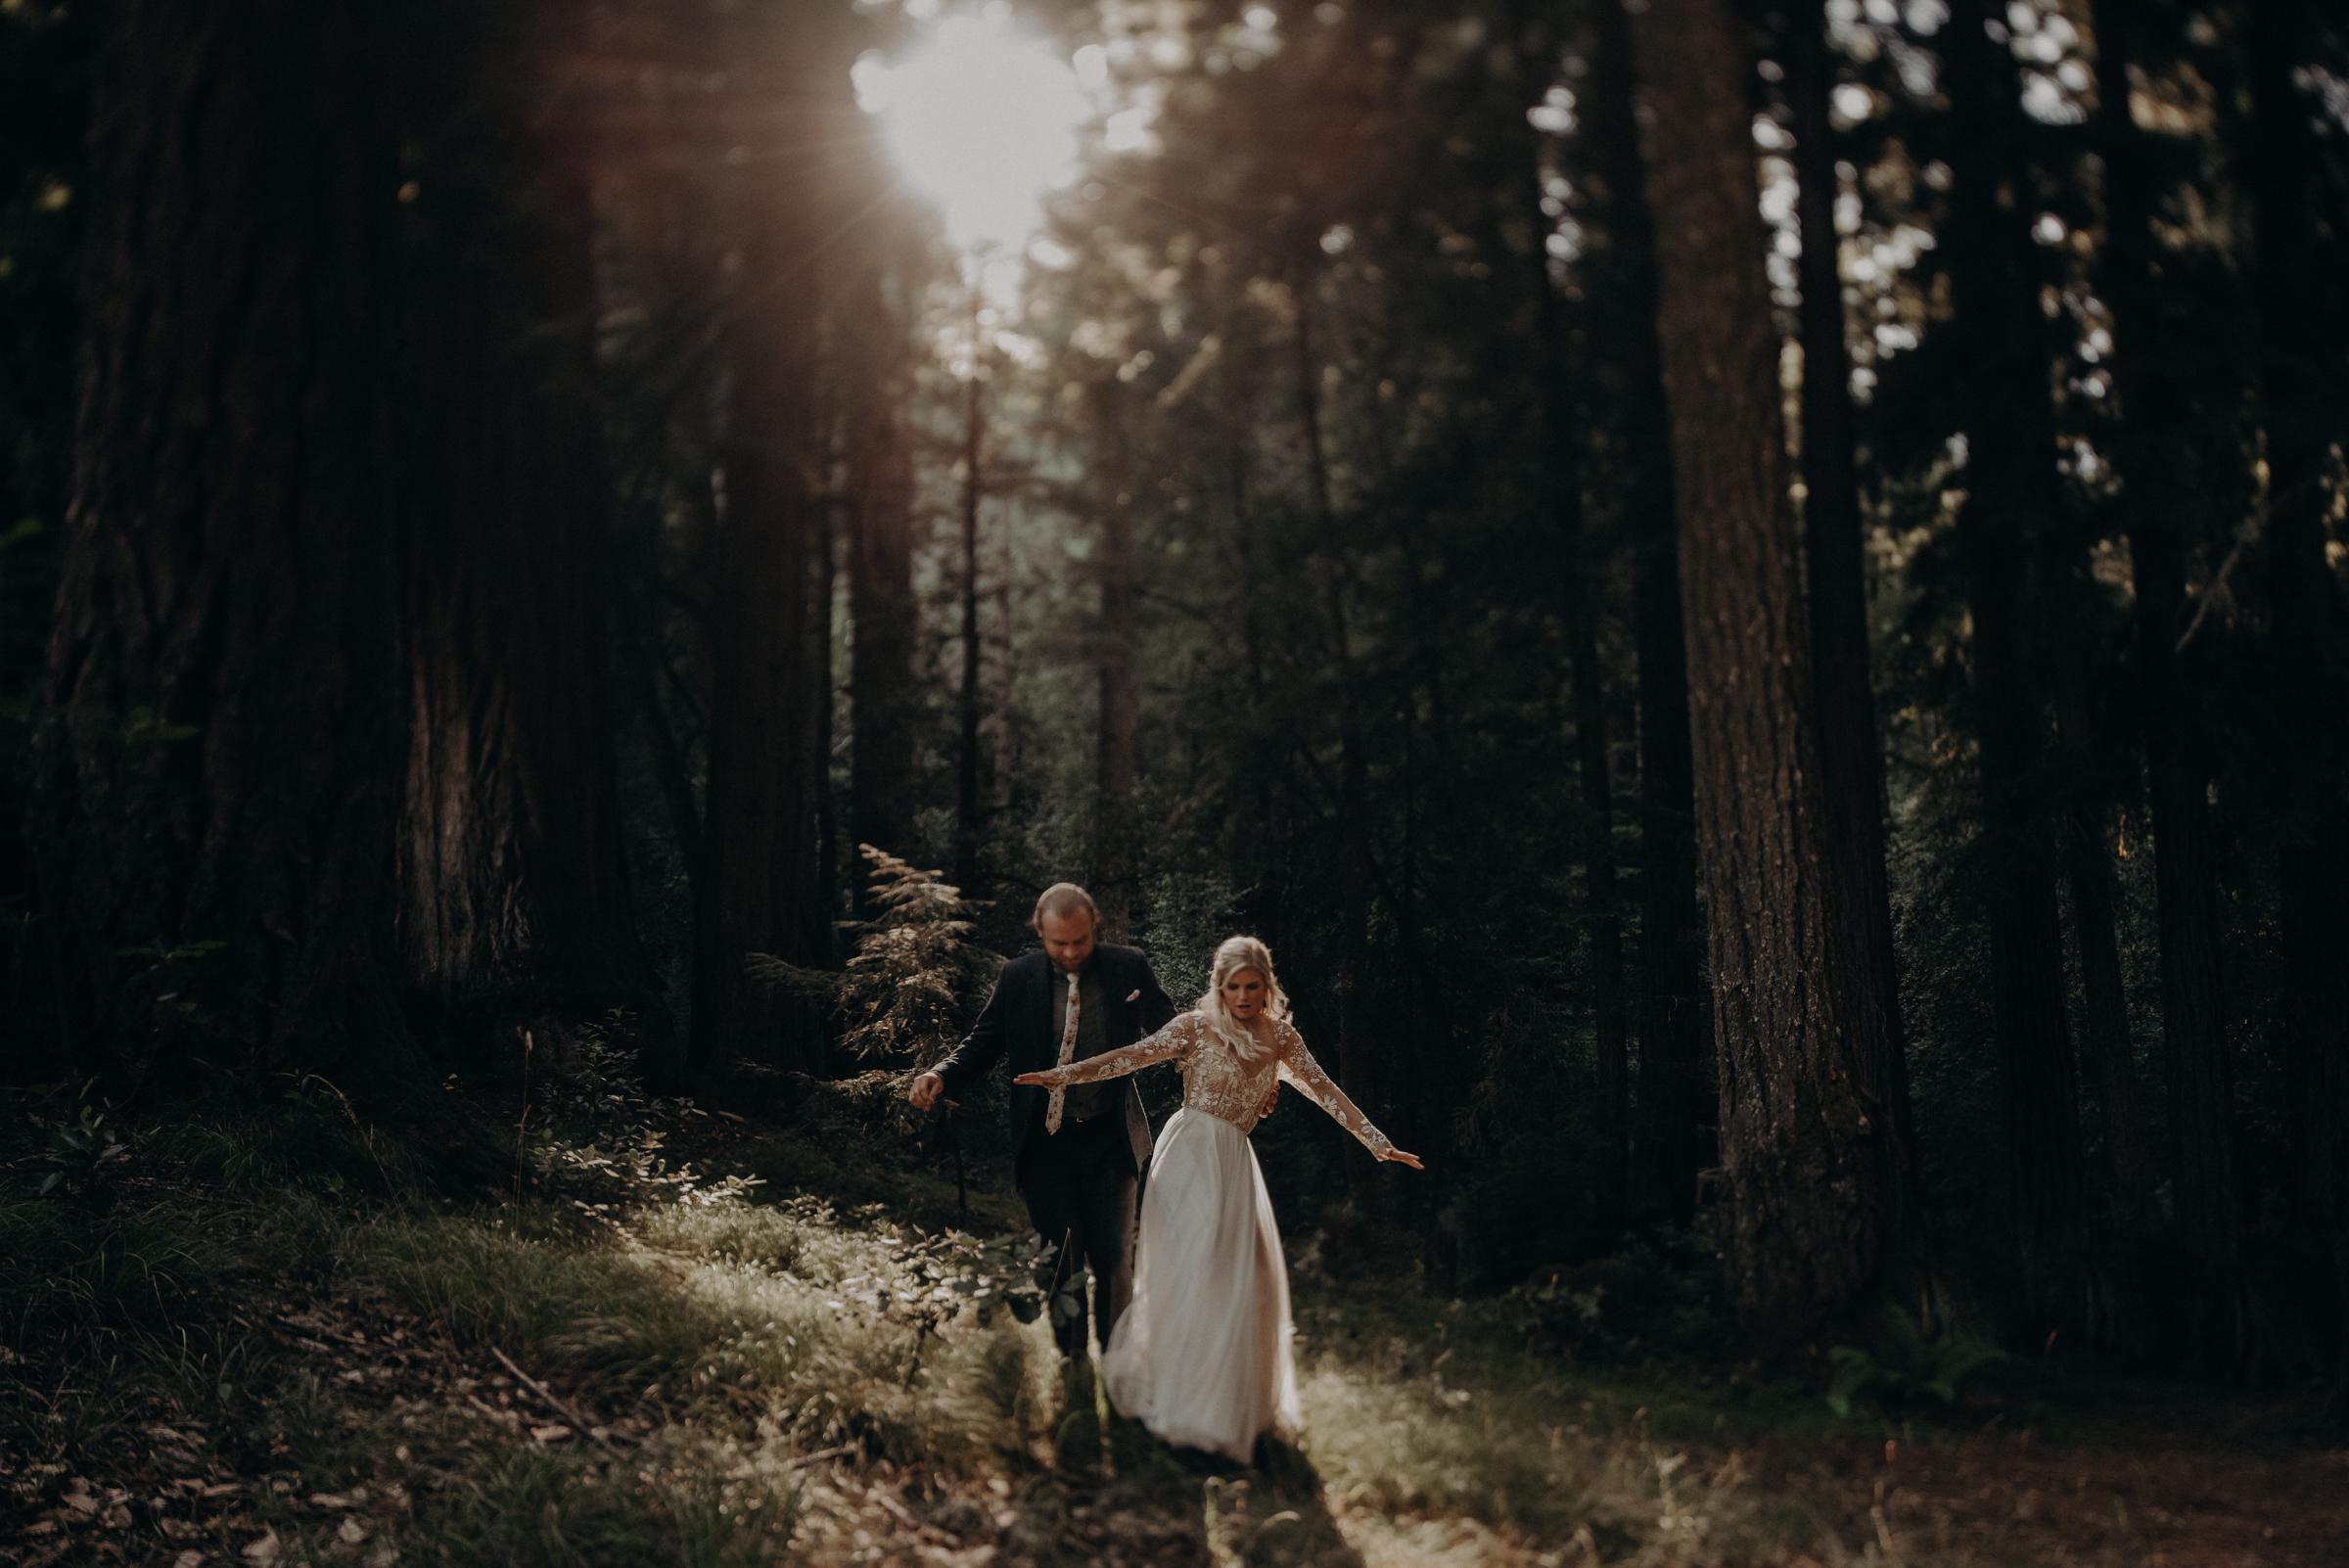 IsaiahAndTaylor.com - California Destination Elopement, Lake Leonard Reserve Wedding, Ukiah-154.jpg